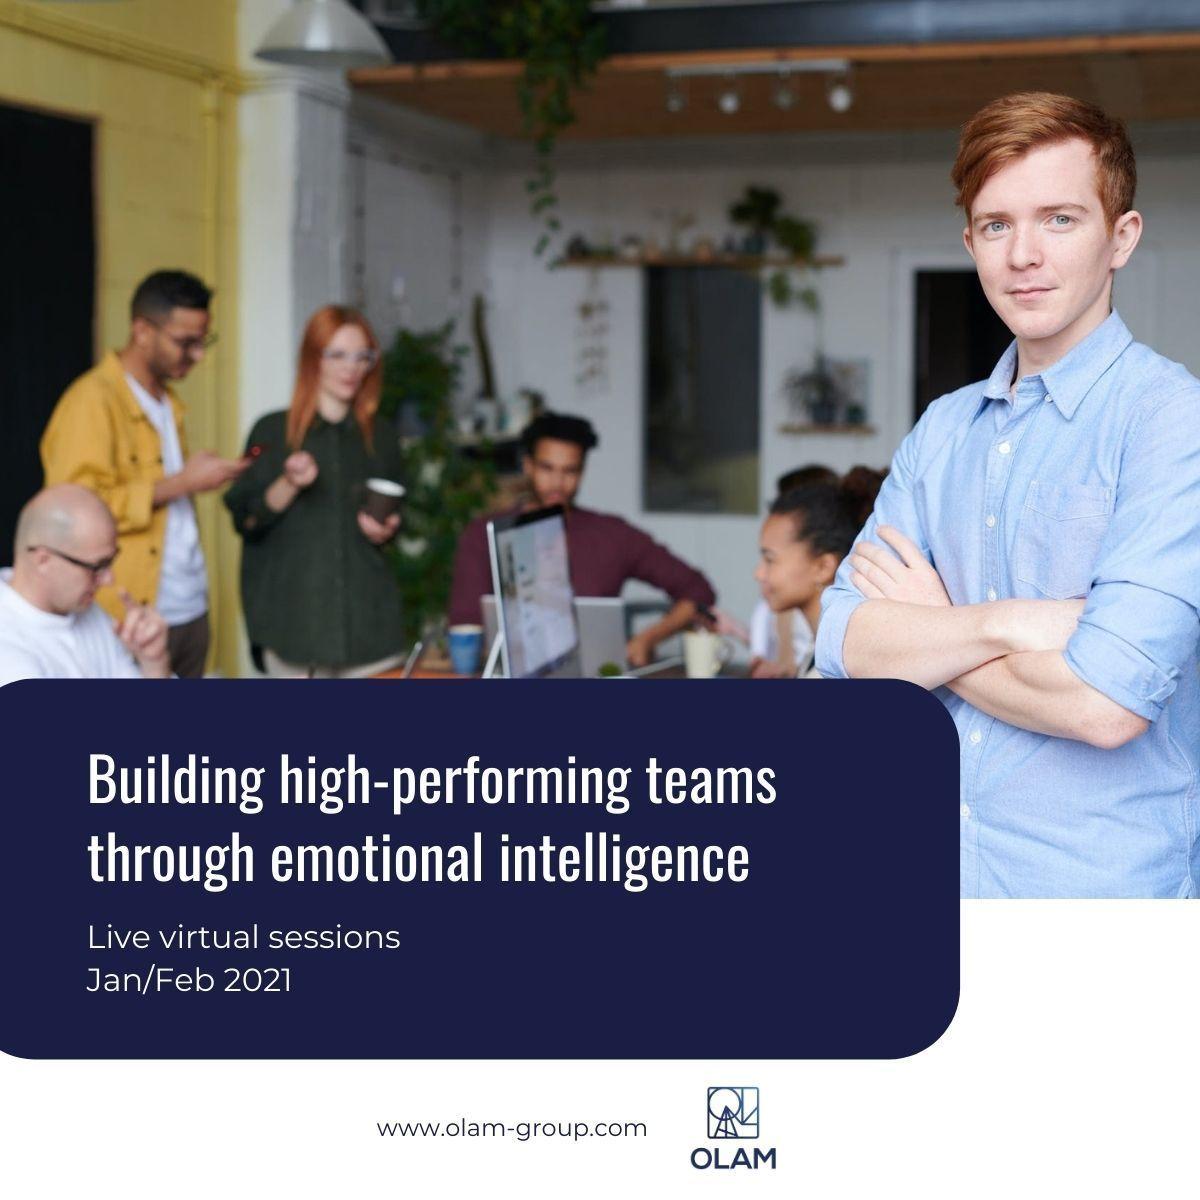 Building High-Performing Teams through Emotional Intelligence